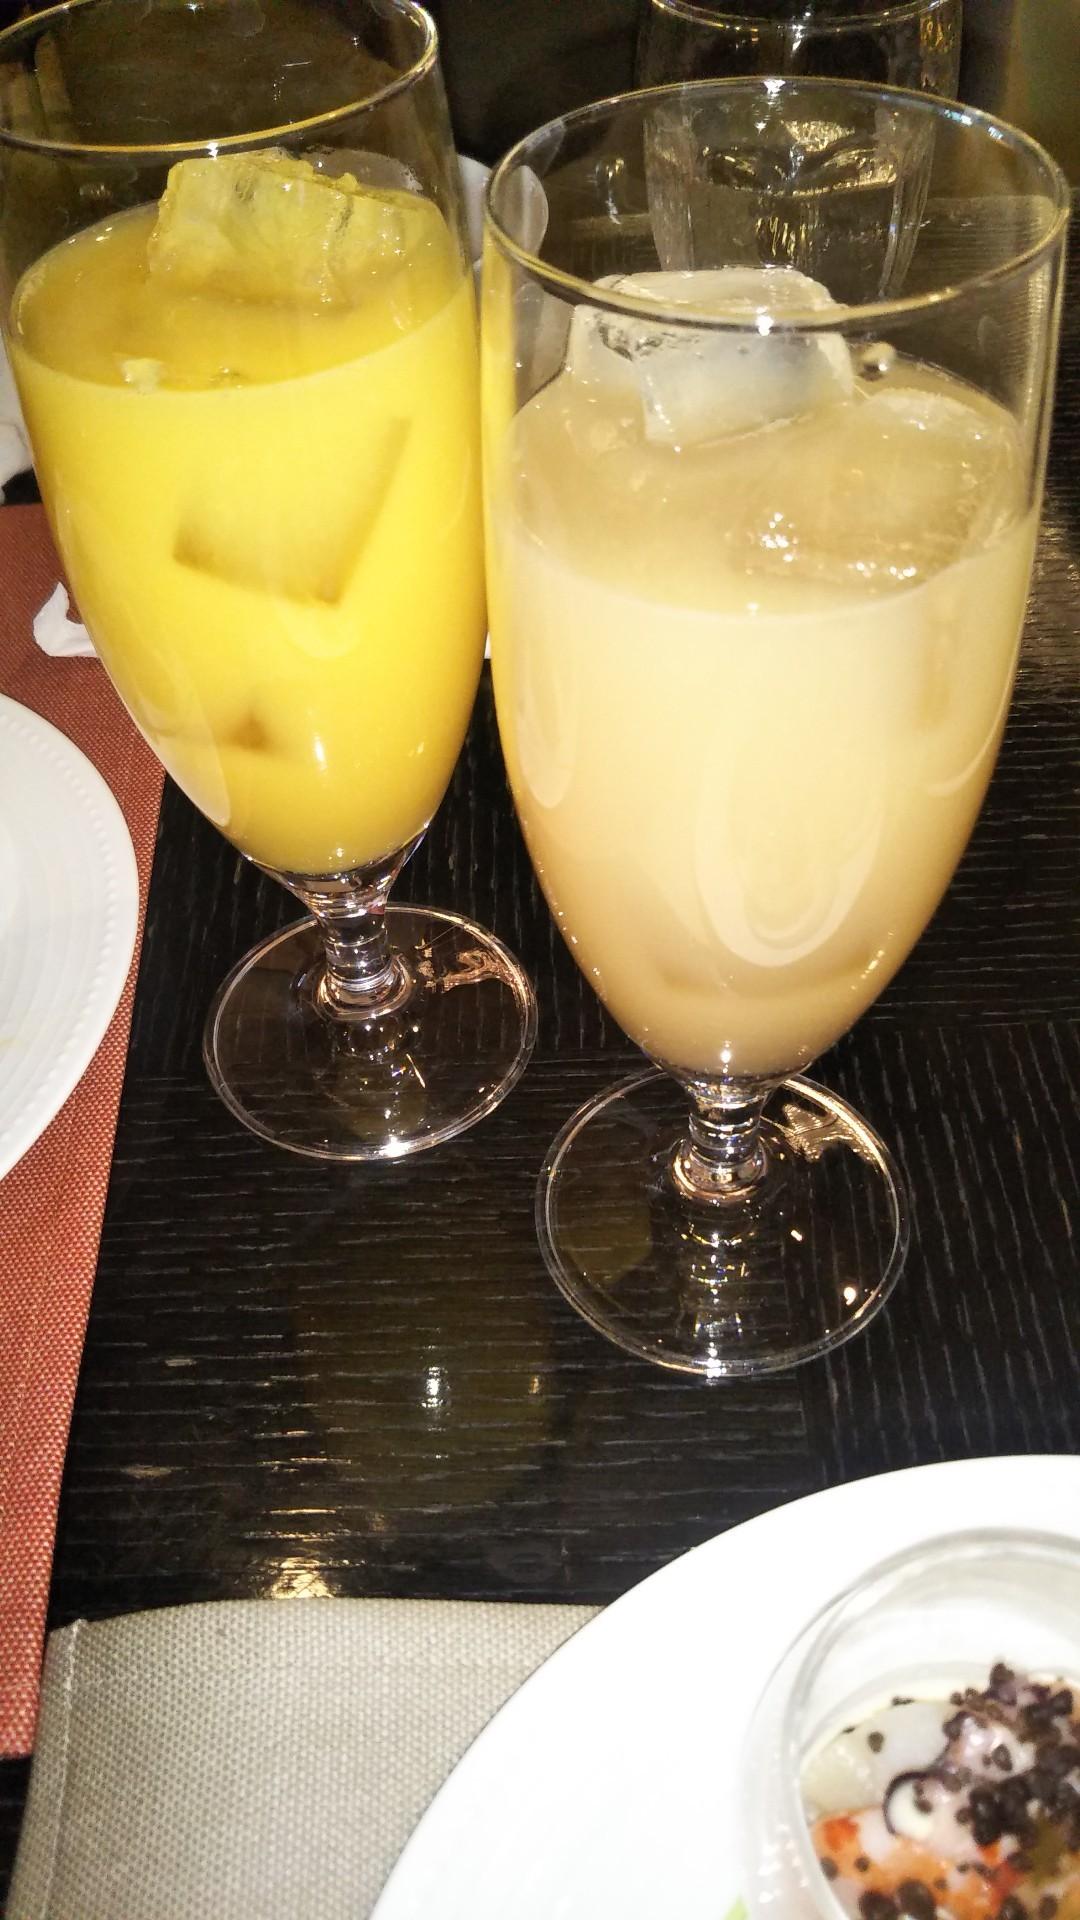 ANAインターコンチネンタルホテル東京 シャンパン・バー チョコレート・スイーツブッフェ_f0076001_22000824.jpg